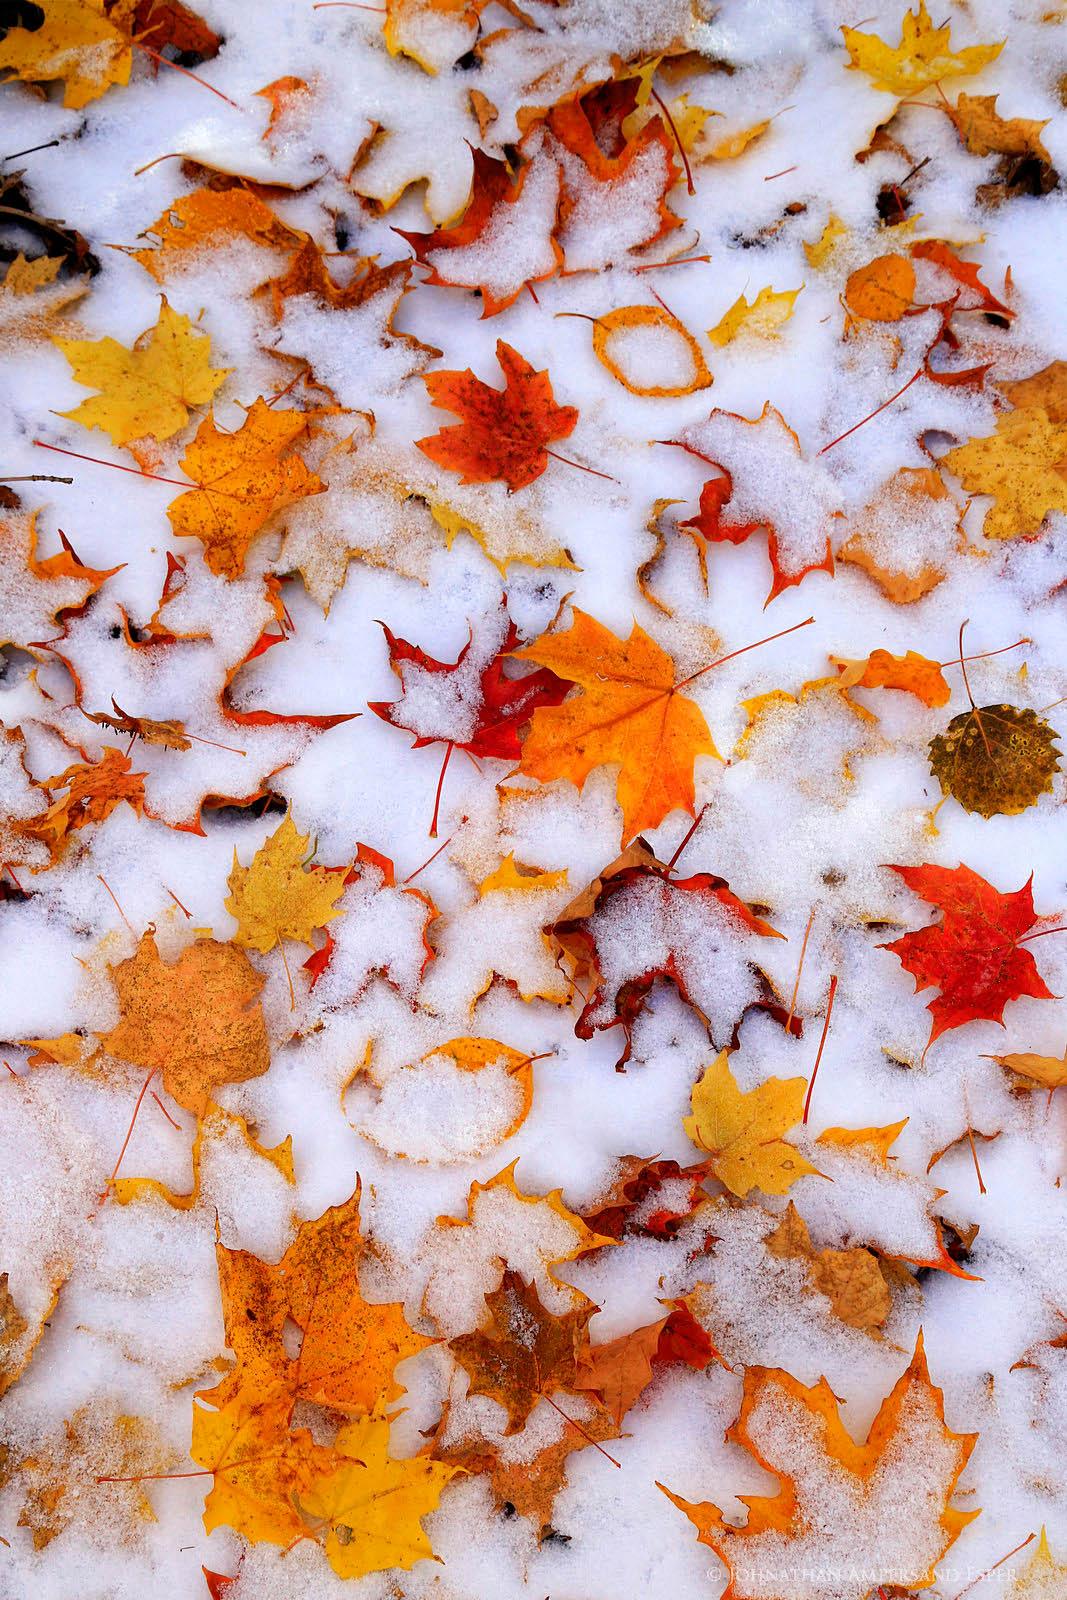 Snow Mt,snow,dusting,snow dusting,maple leaves,maple,autumn snow,autumn snowfall,detail,orange,maple,October,Keene Valley, photo